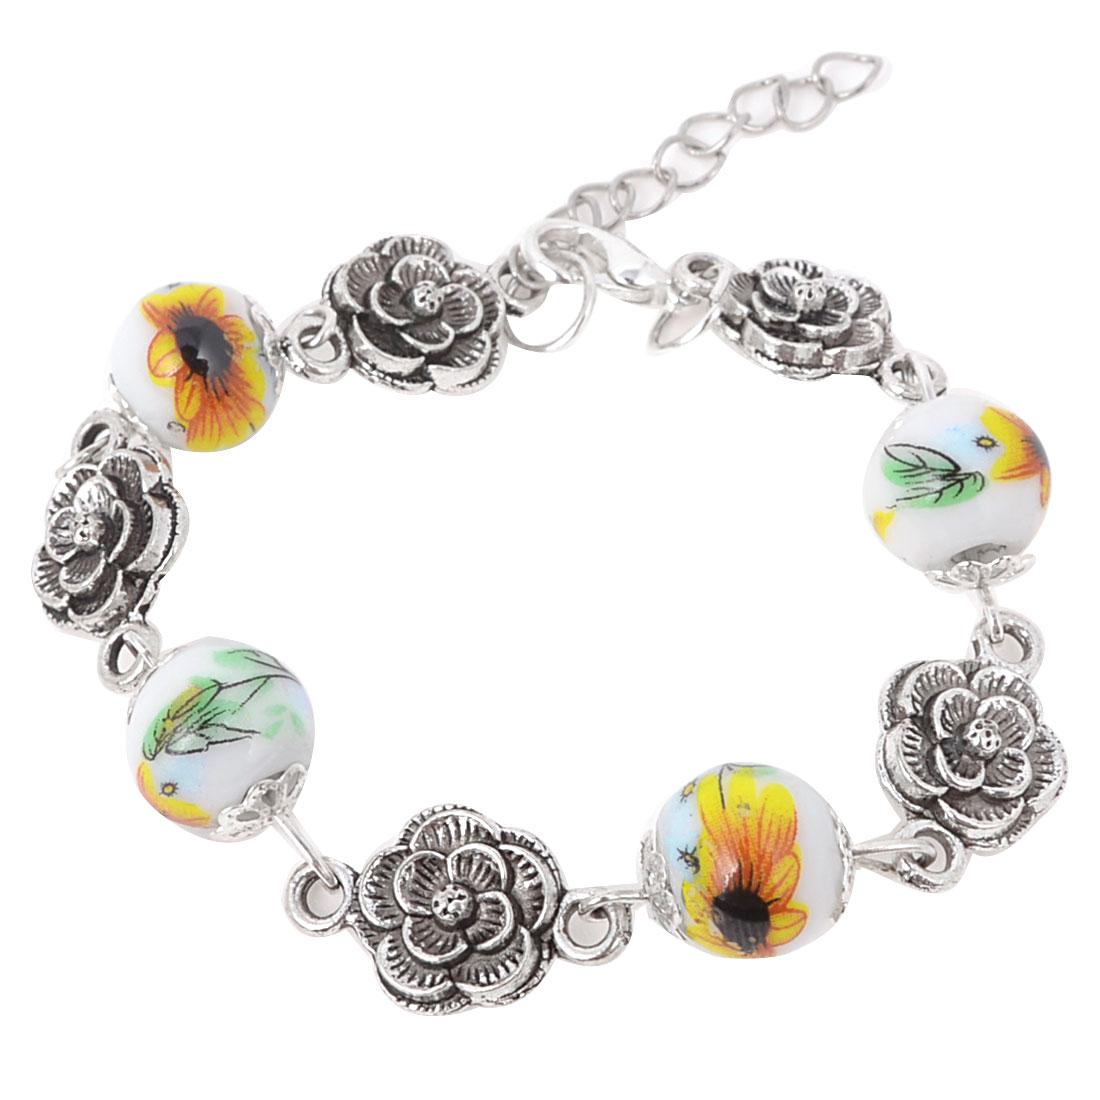 Women Orange Flower Linked Beads Wrist Ornament Ceramic Bracelet Silver Tone